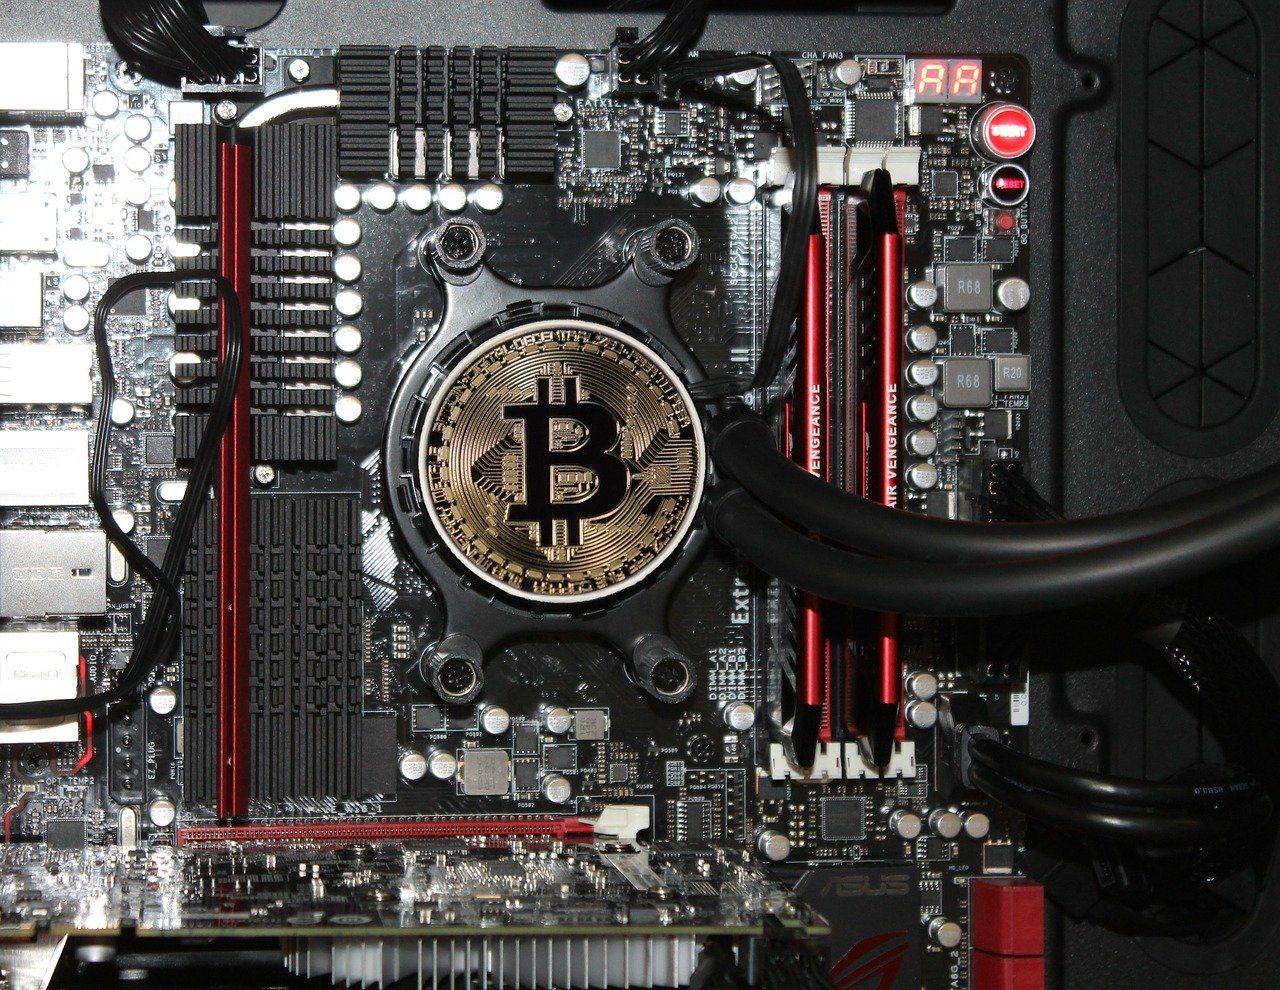 /ethereum-20-vs-bitcoin-cash-vs-algorand-a-comparison-of-upcoming-features-amg3zl2 feature image